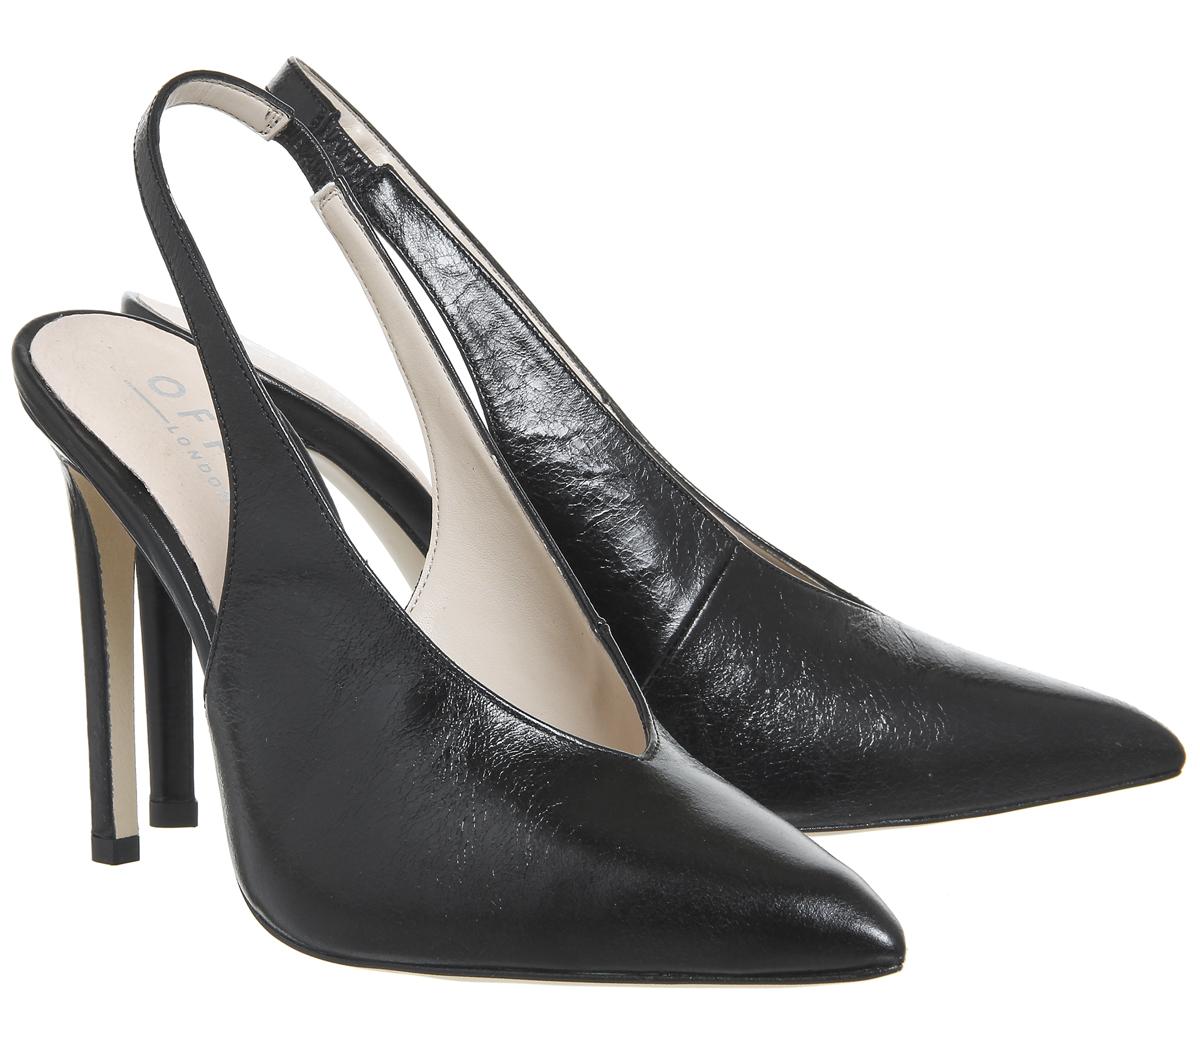 Damenschuhe Office Hix Slingback LEATHER Point Court Heels BLACK LEATHER Slingback Heels 17e40d